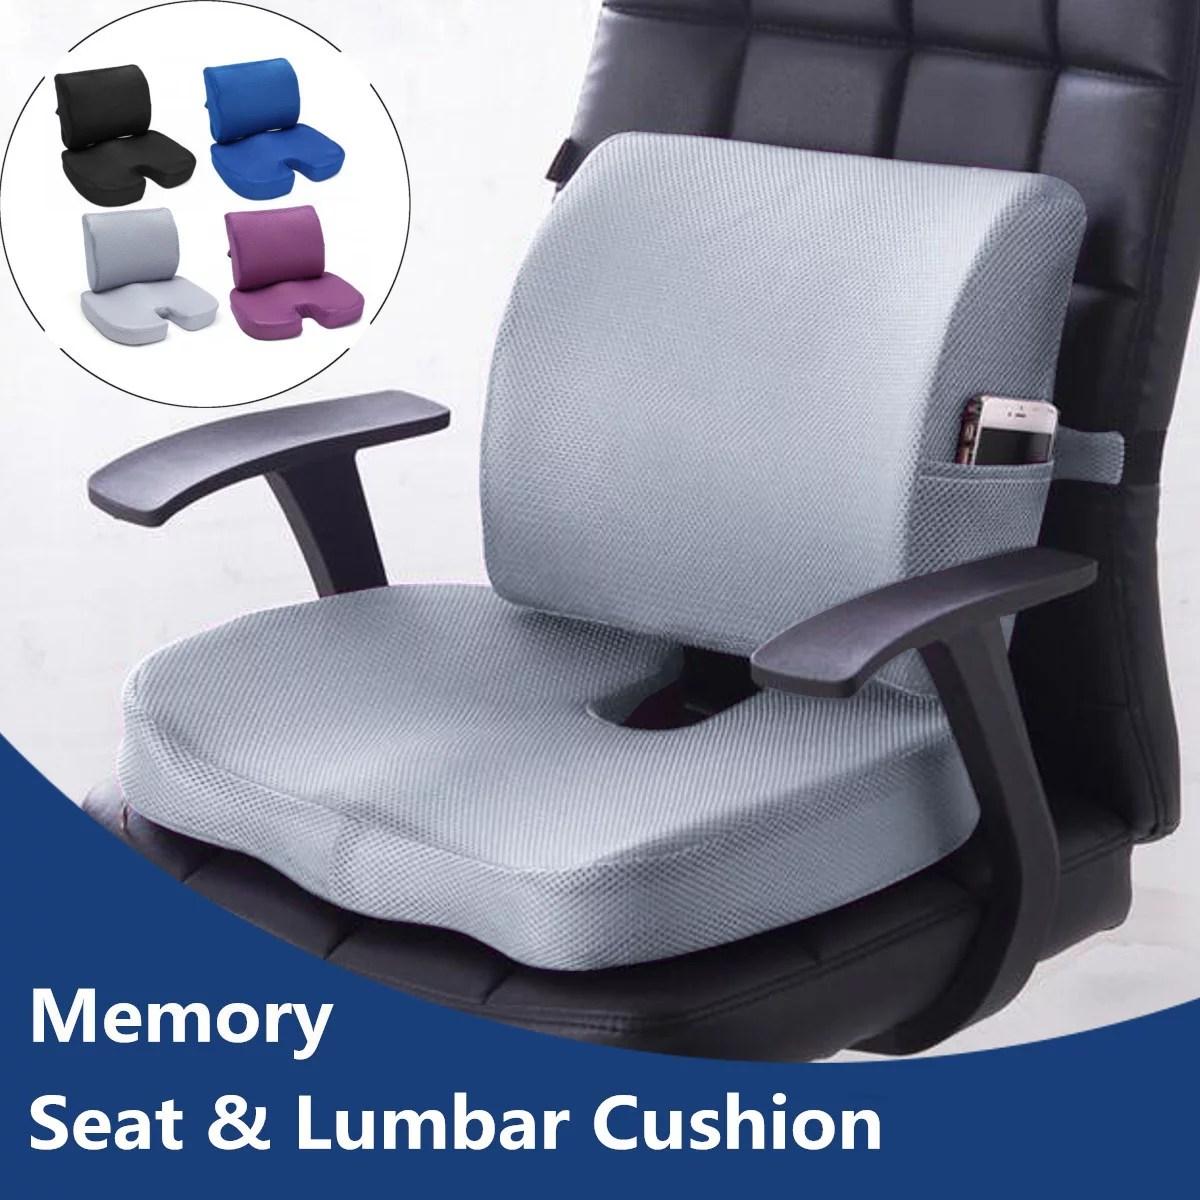 seat cushion for office memory foam car seat cushion mesh lumbar support pillow orthopedic seat cushion chair lumbar support back pillow for